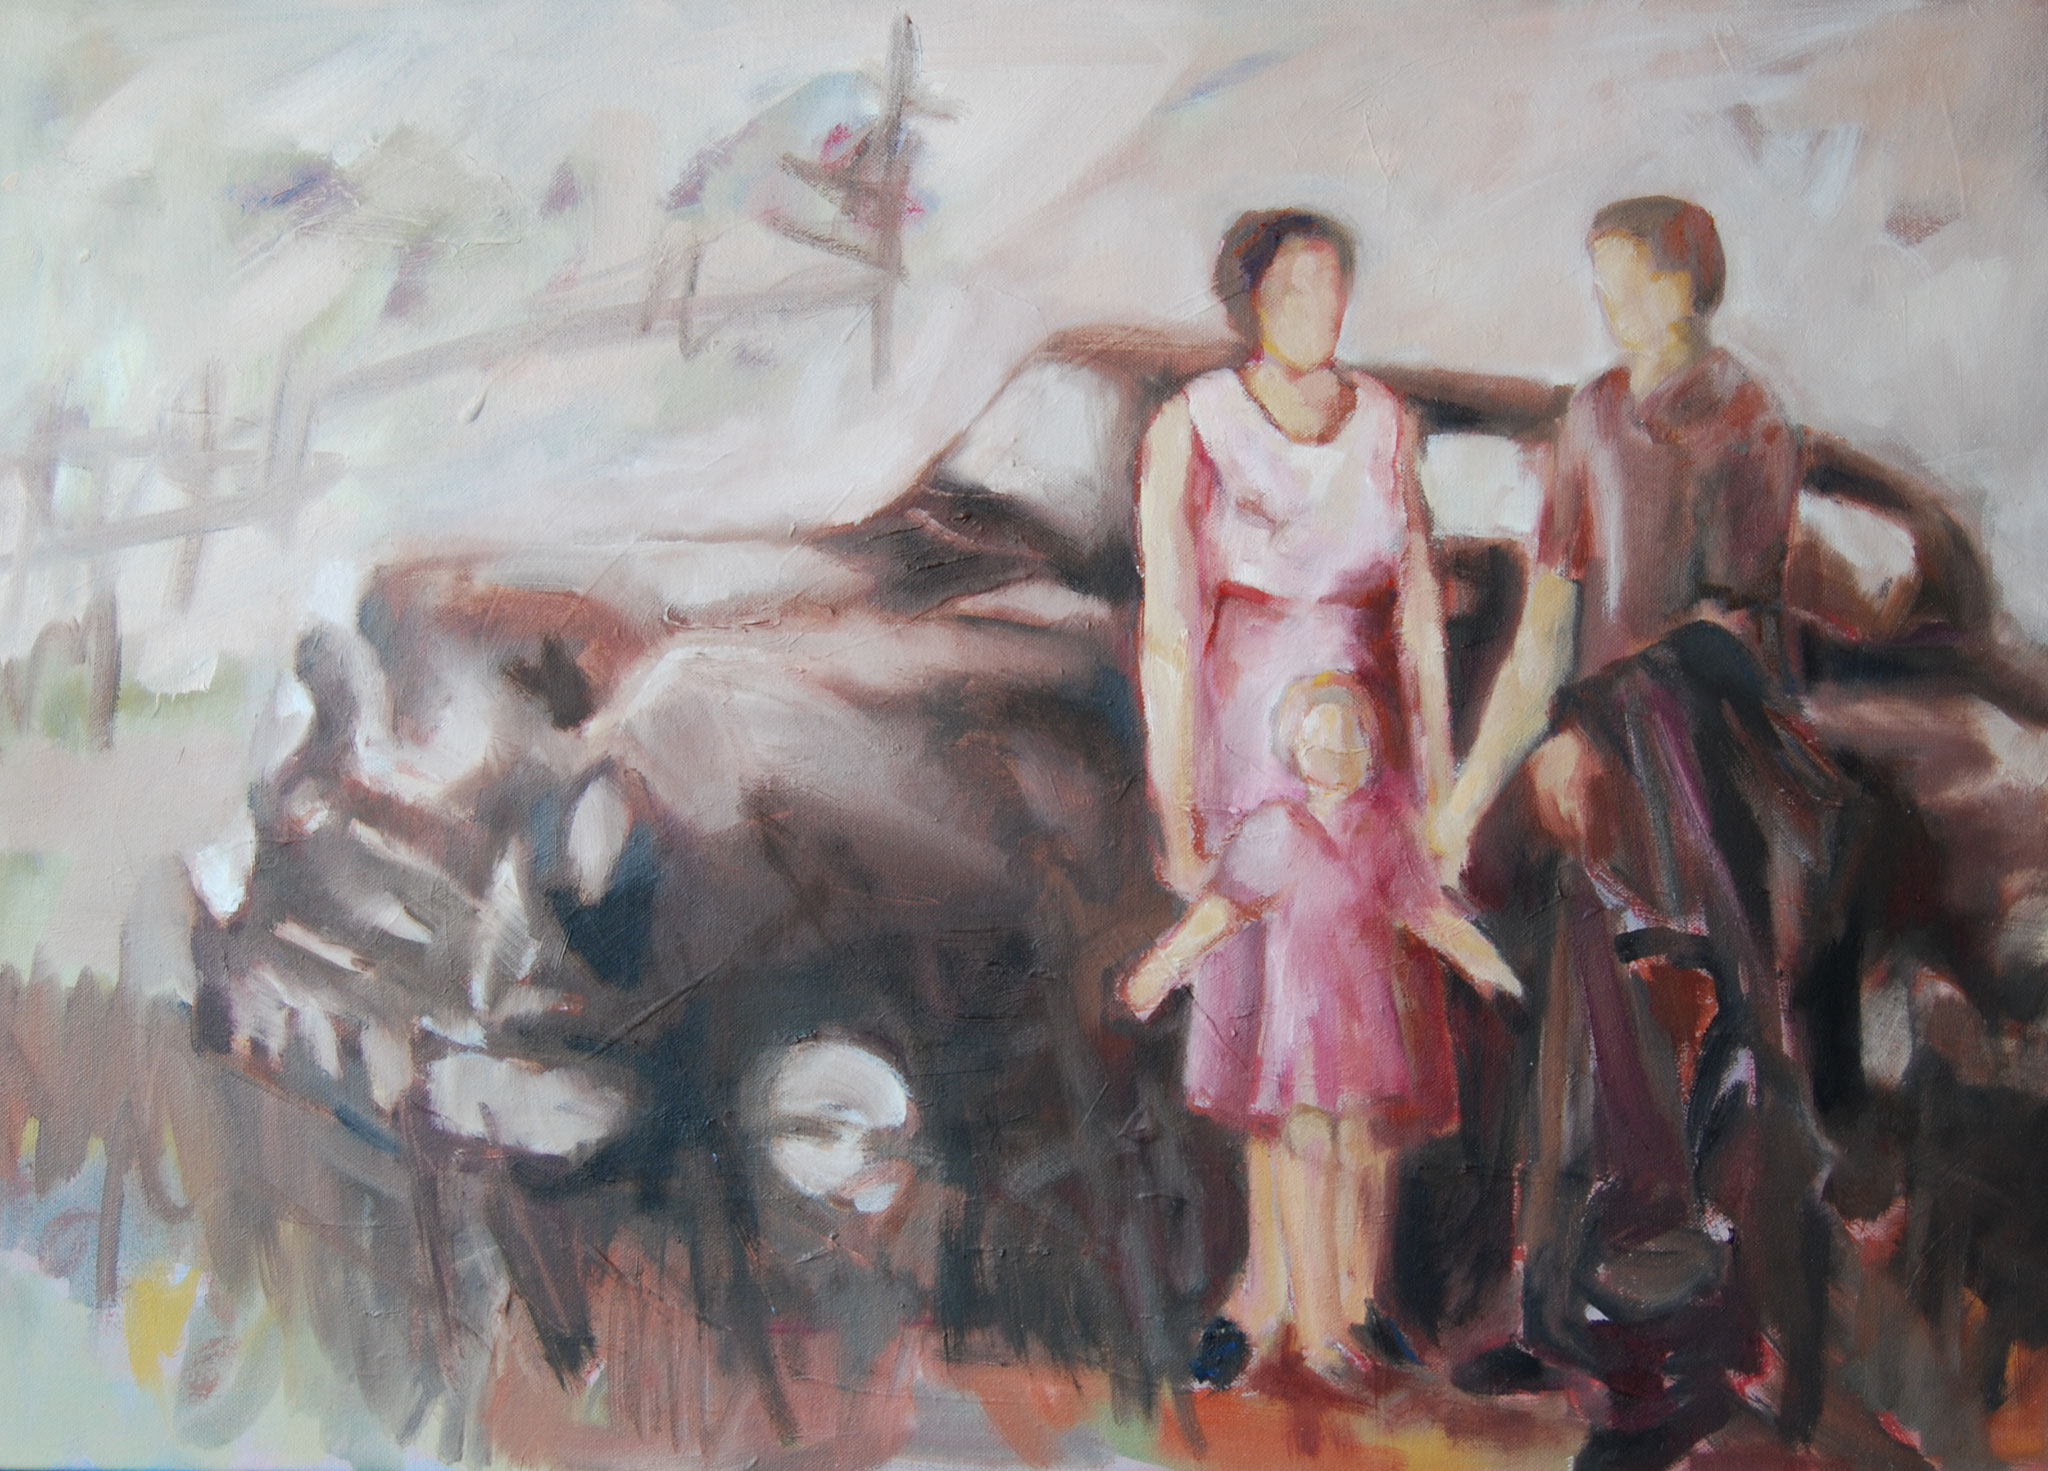 Memories 17A, 2017, Öl auf Leinwand, 50 x 70 cm